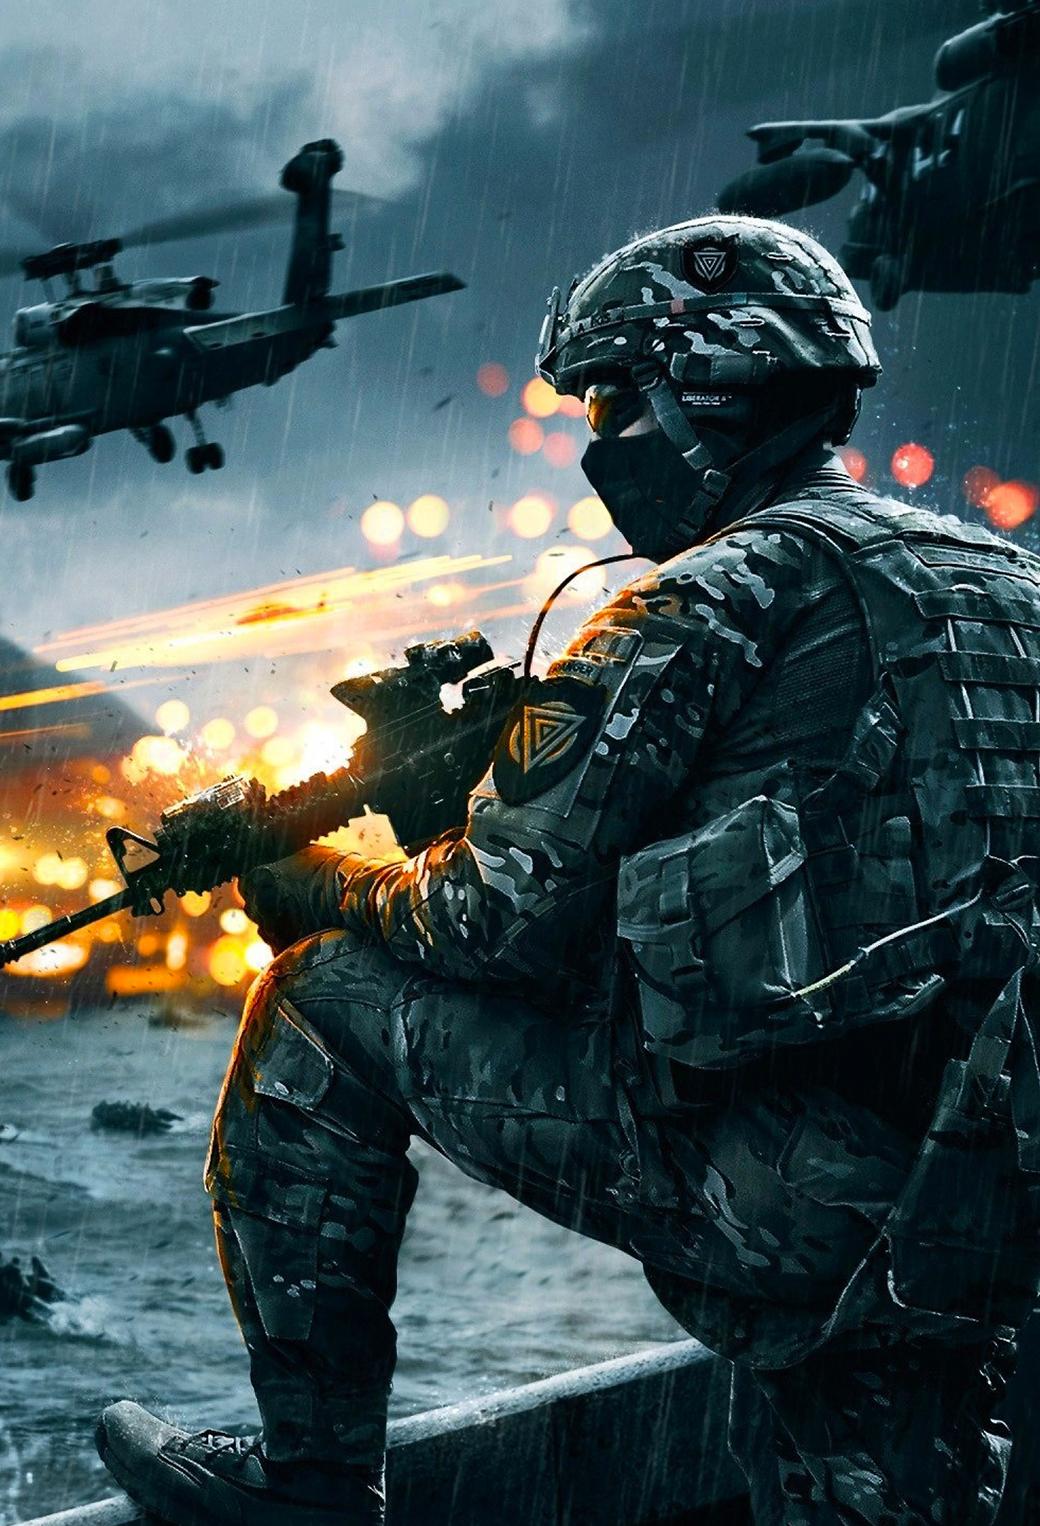 BattleStrats - Čety - Battlelog / Battlefield 3